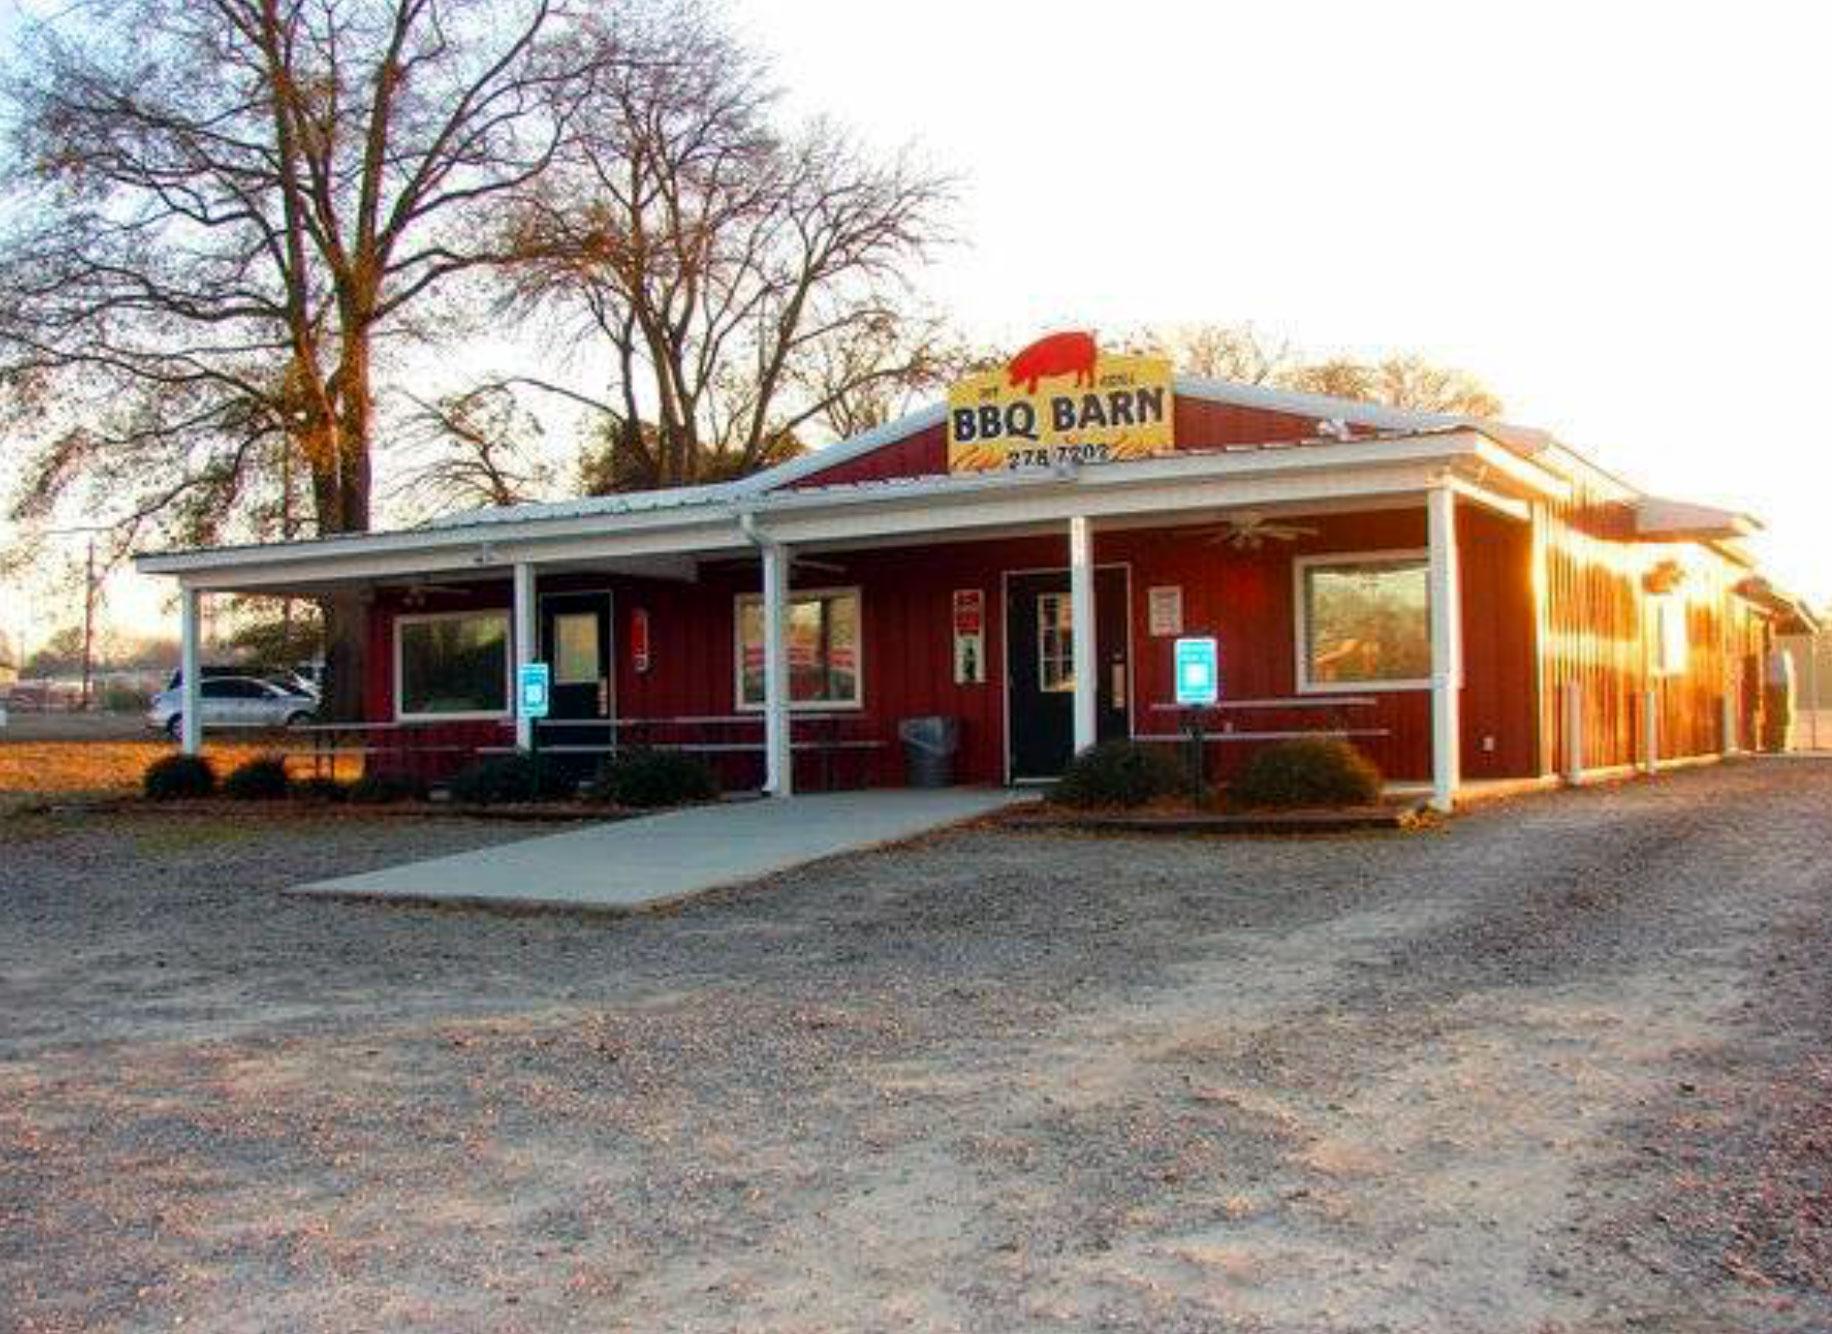 BBQ Barn in N. Augusta